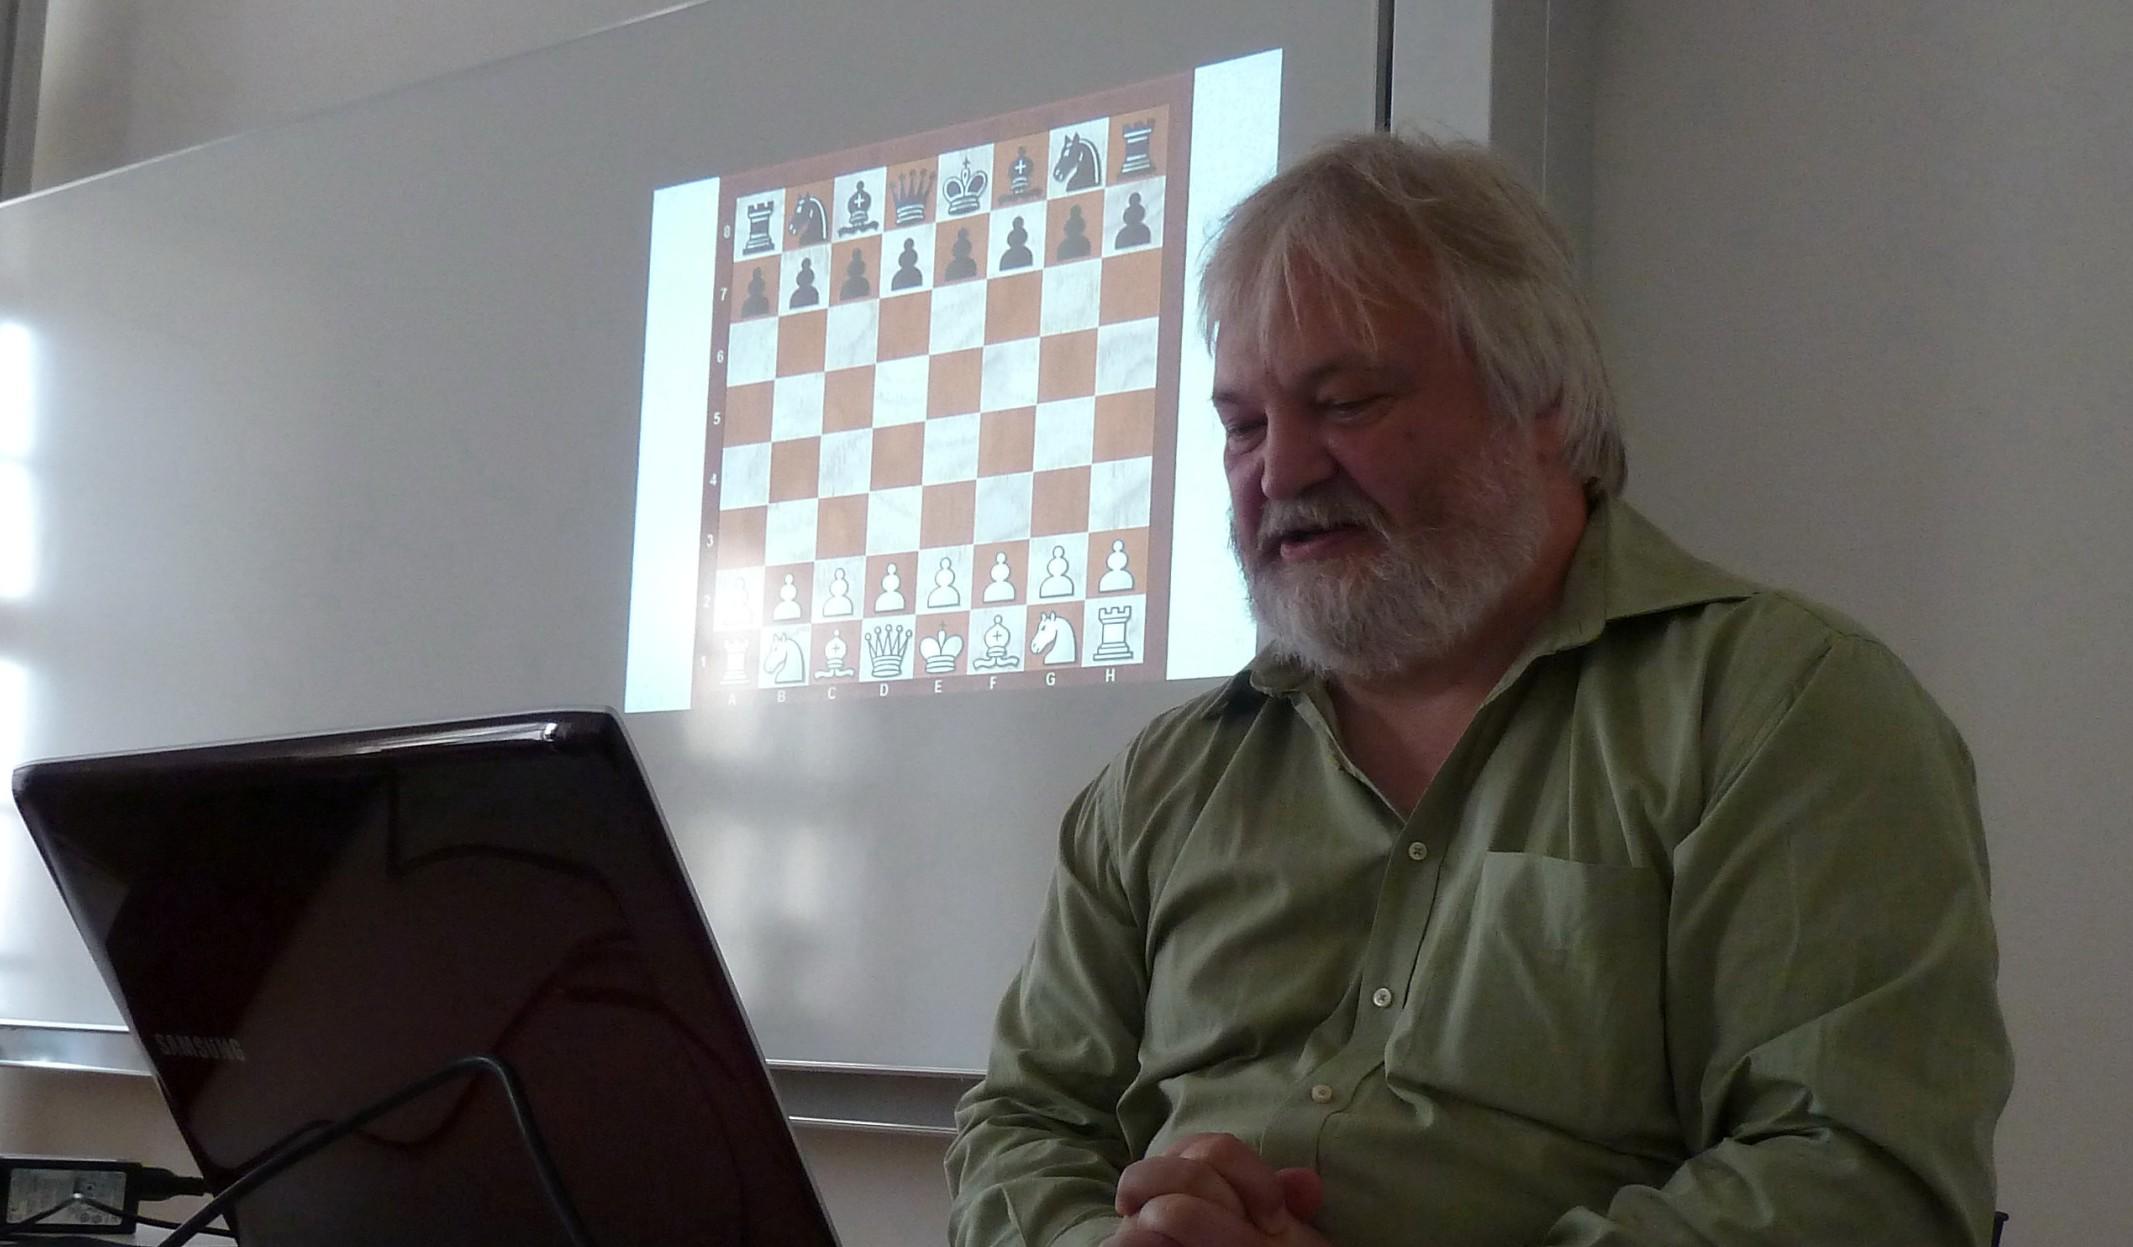 Zeitnot-Seminar mit Artur Jussupow